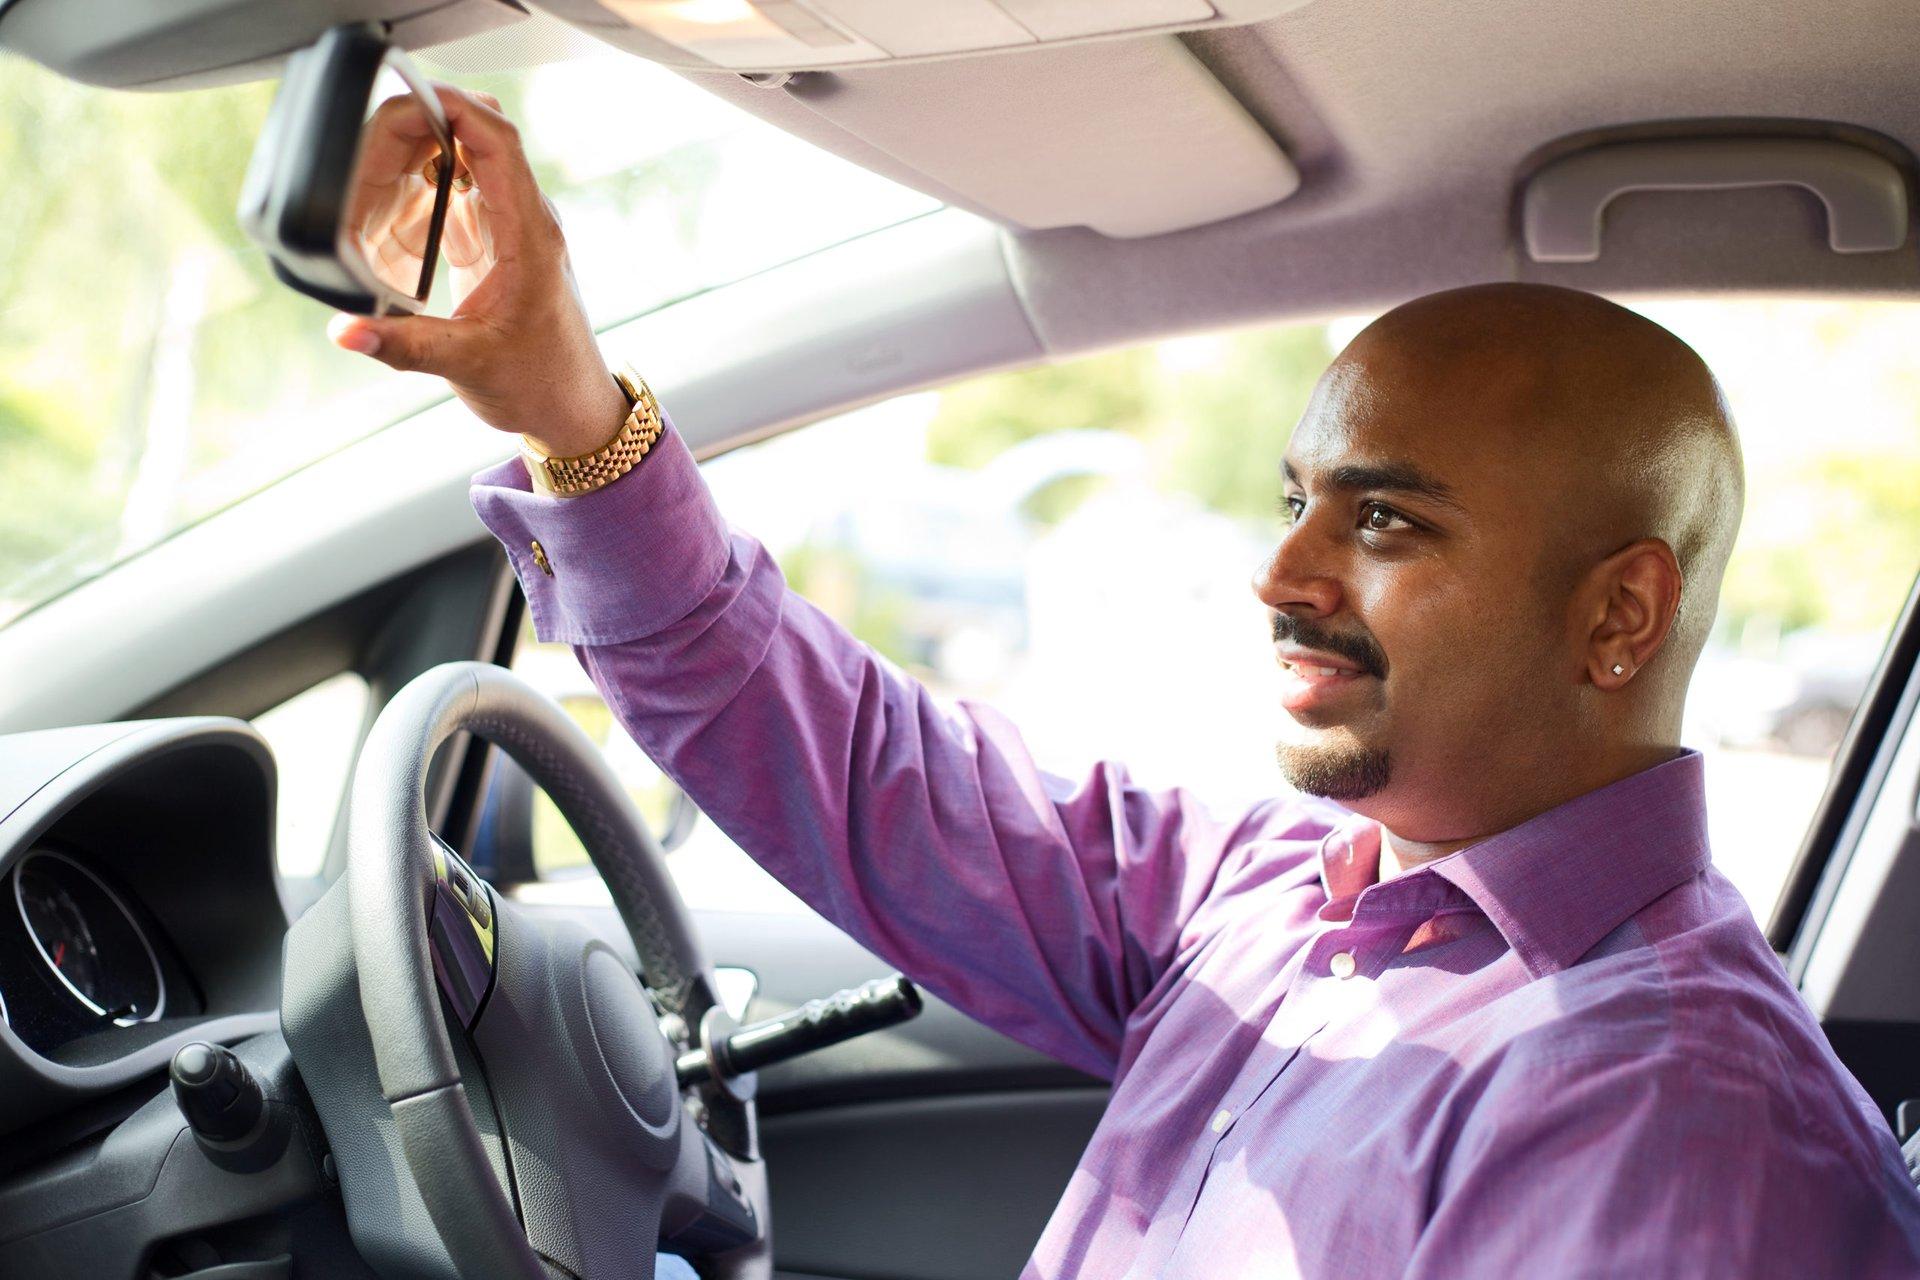 Driver adjusting his mirror